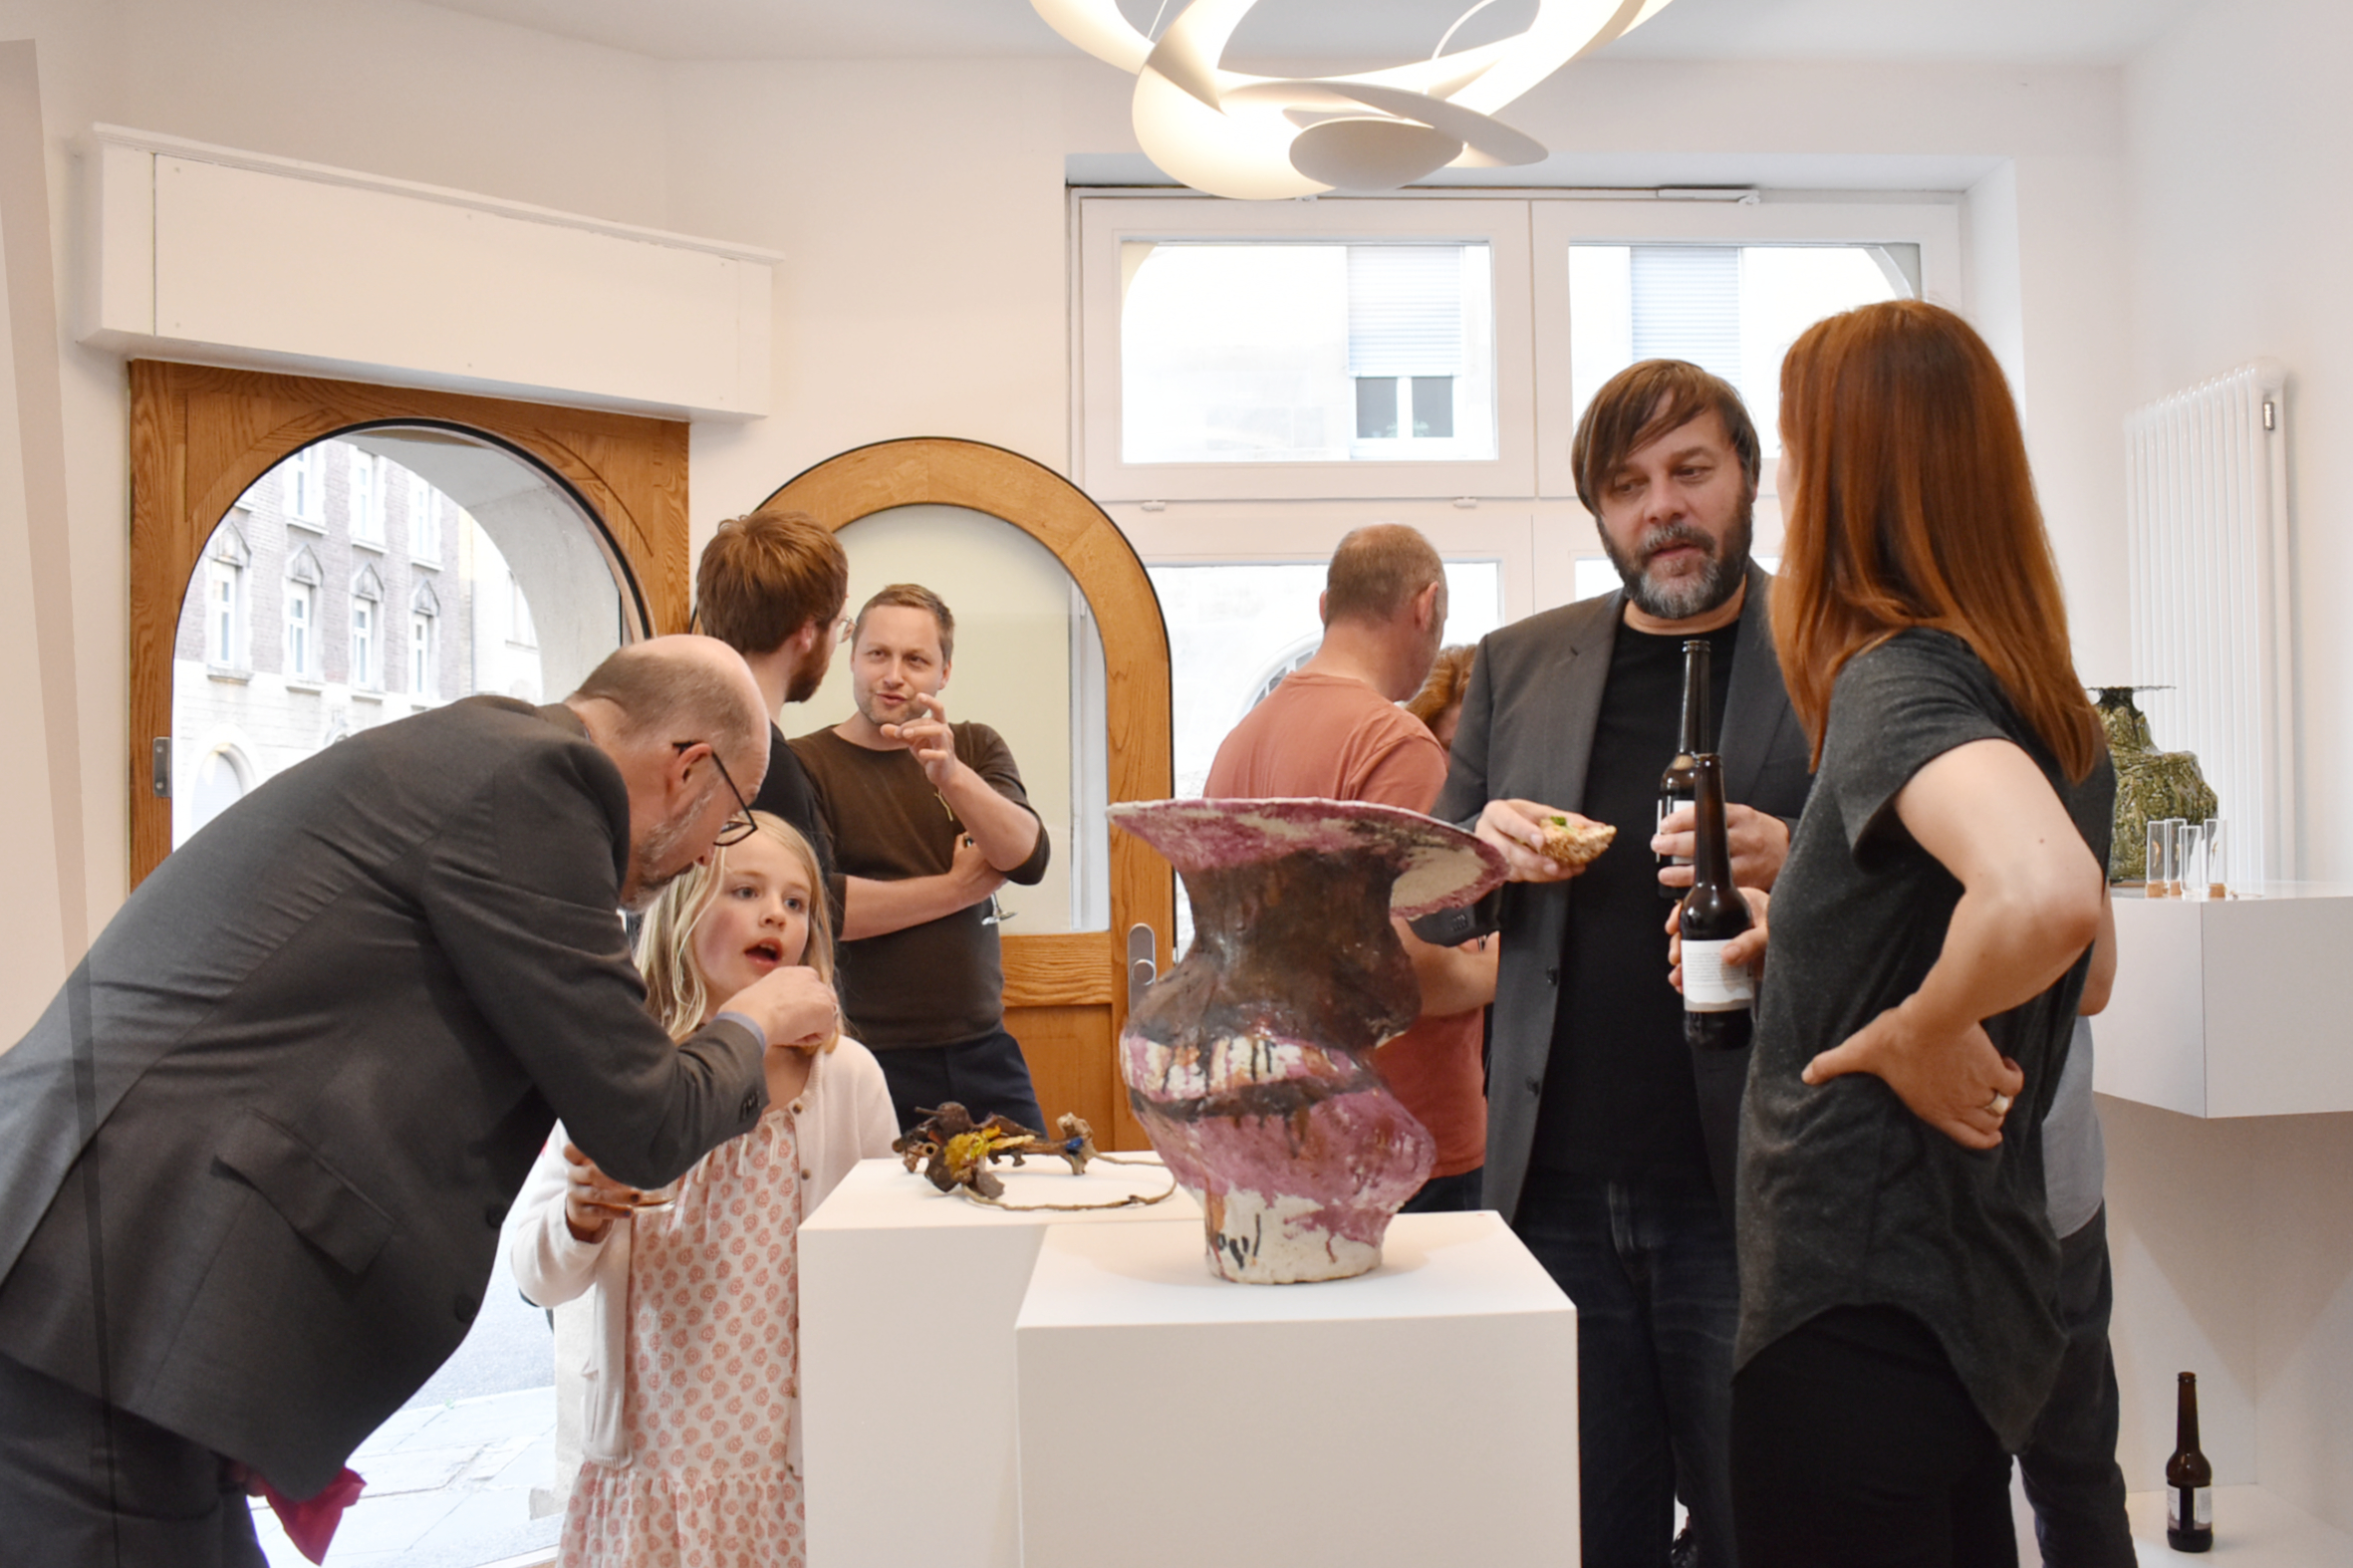 arnoldsche weekend gallery #6, 2018. Foto arnoldsche Art Publishers